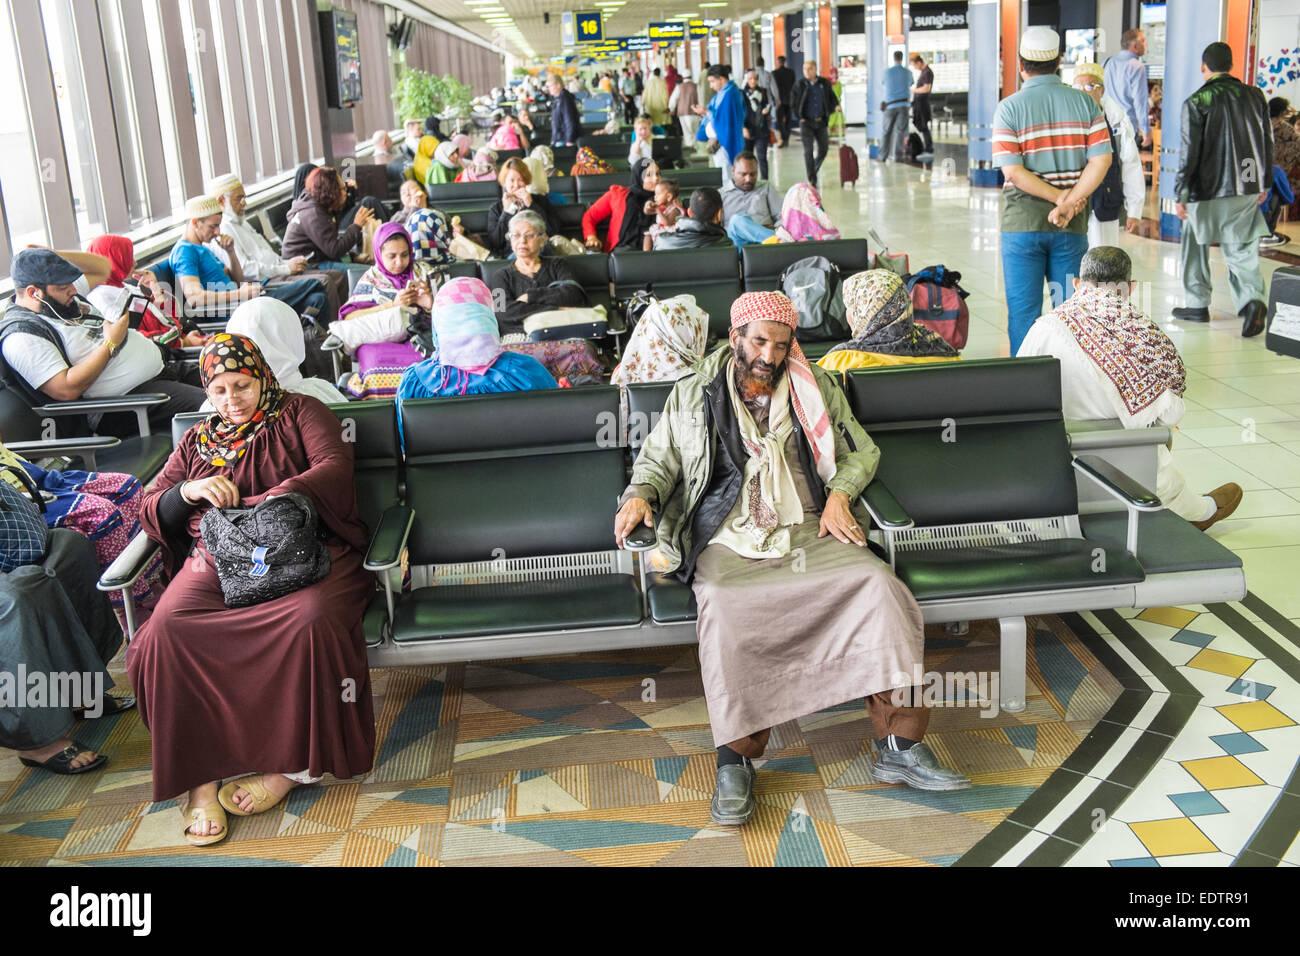 L'Aéroport International de Bahreïn, Bahreïn, Moyen-Orient Photo Stock